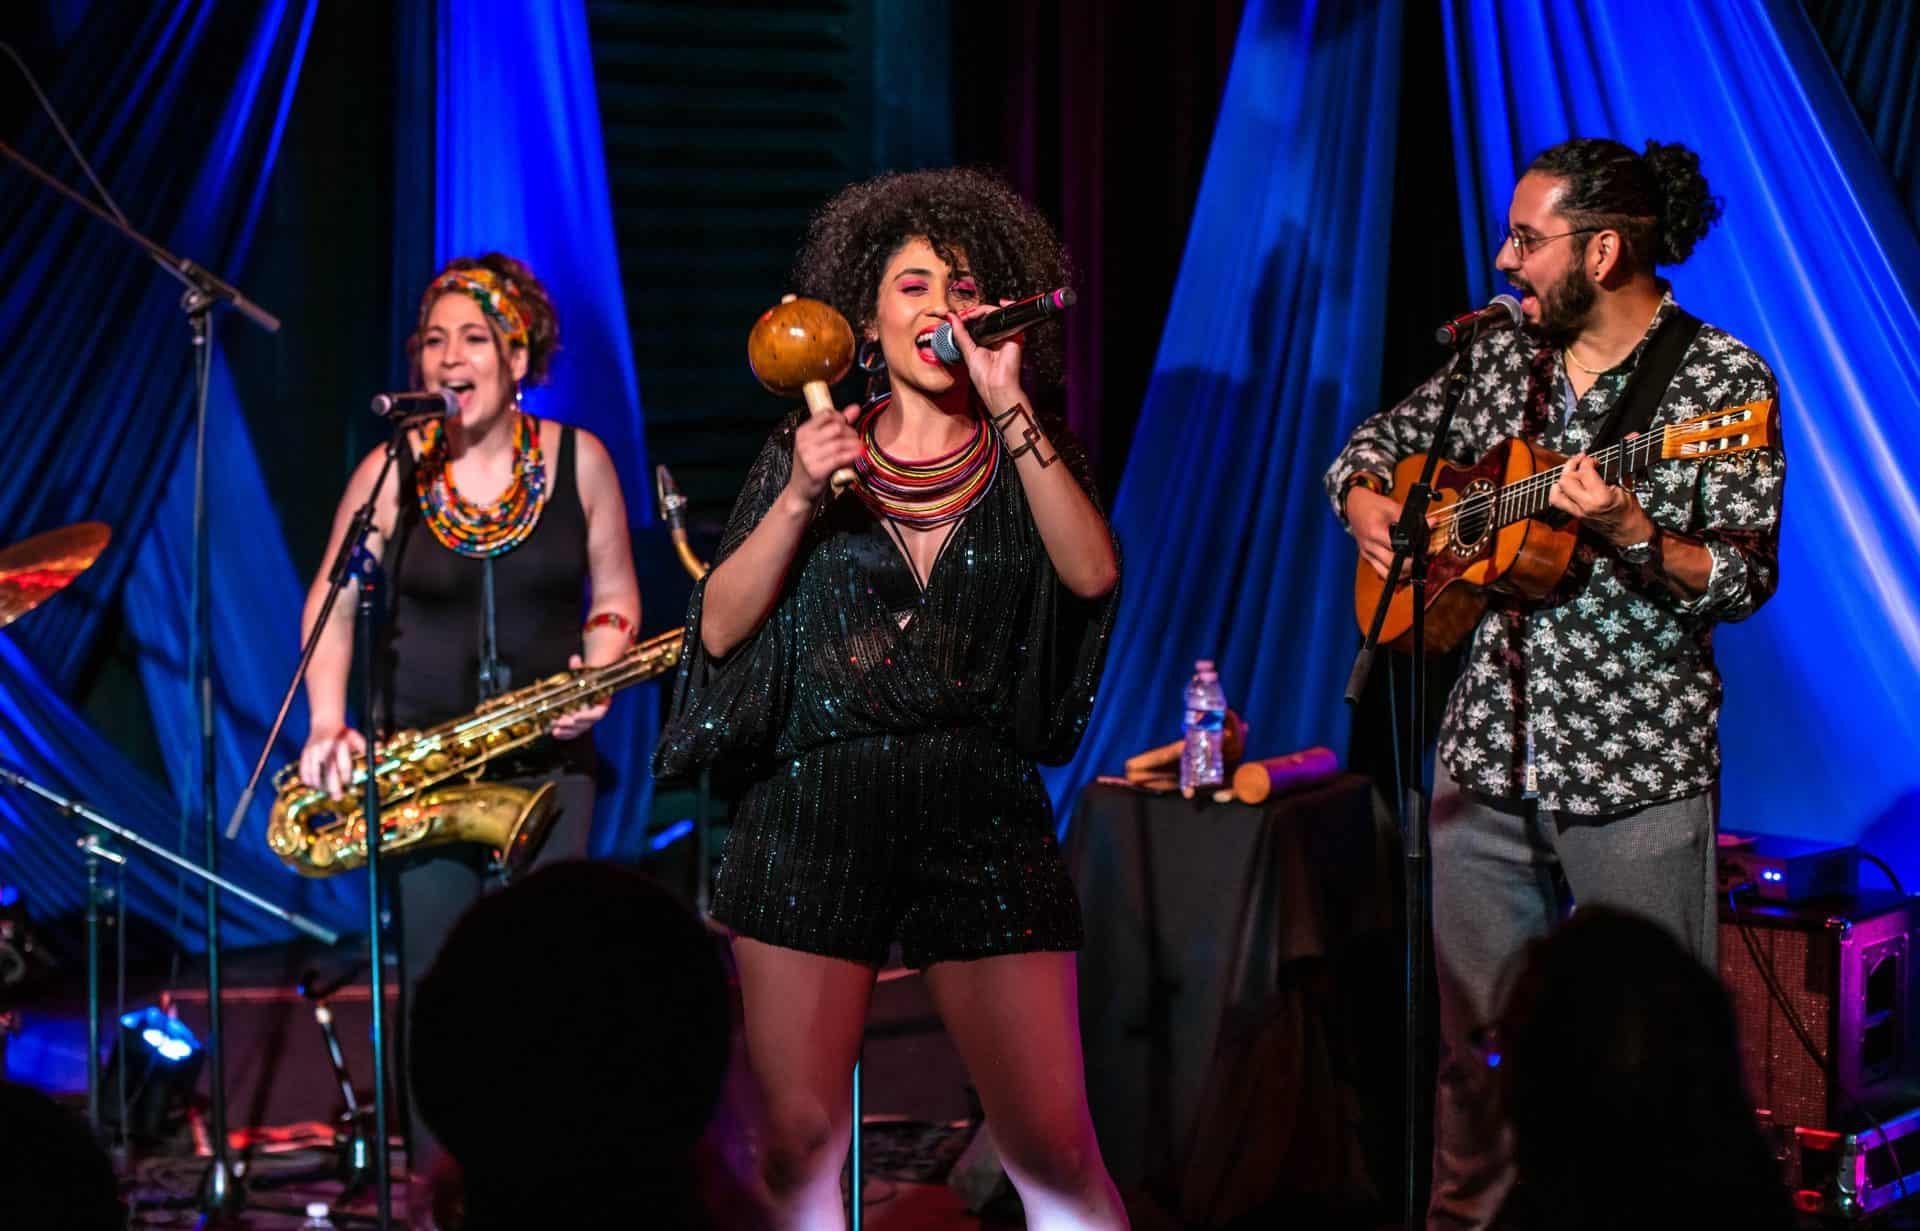 Alea and band performing at Kimmel Center copy